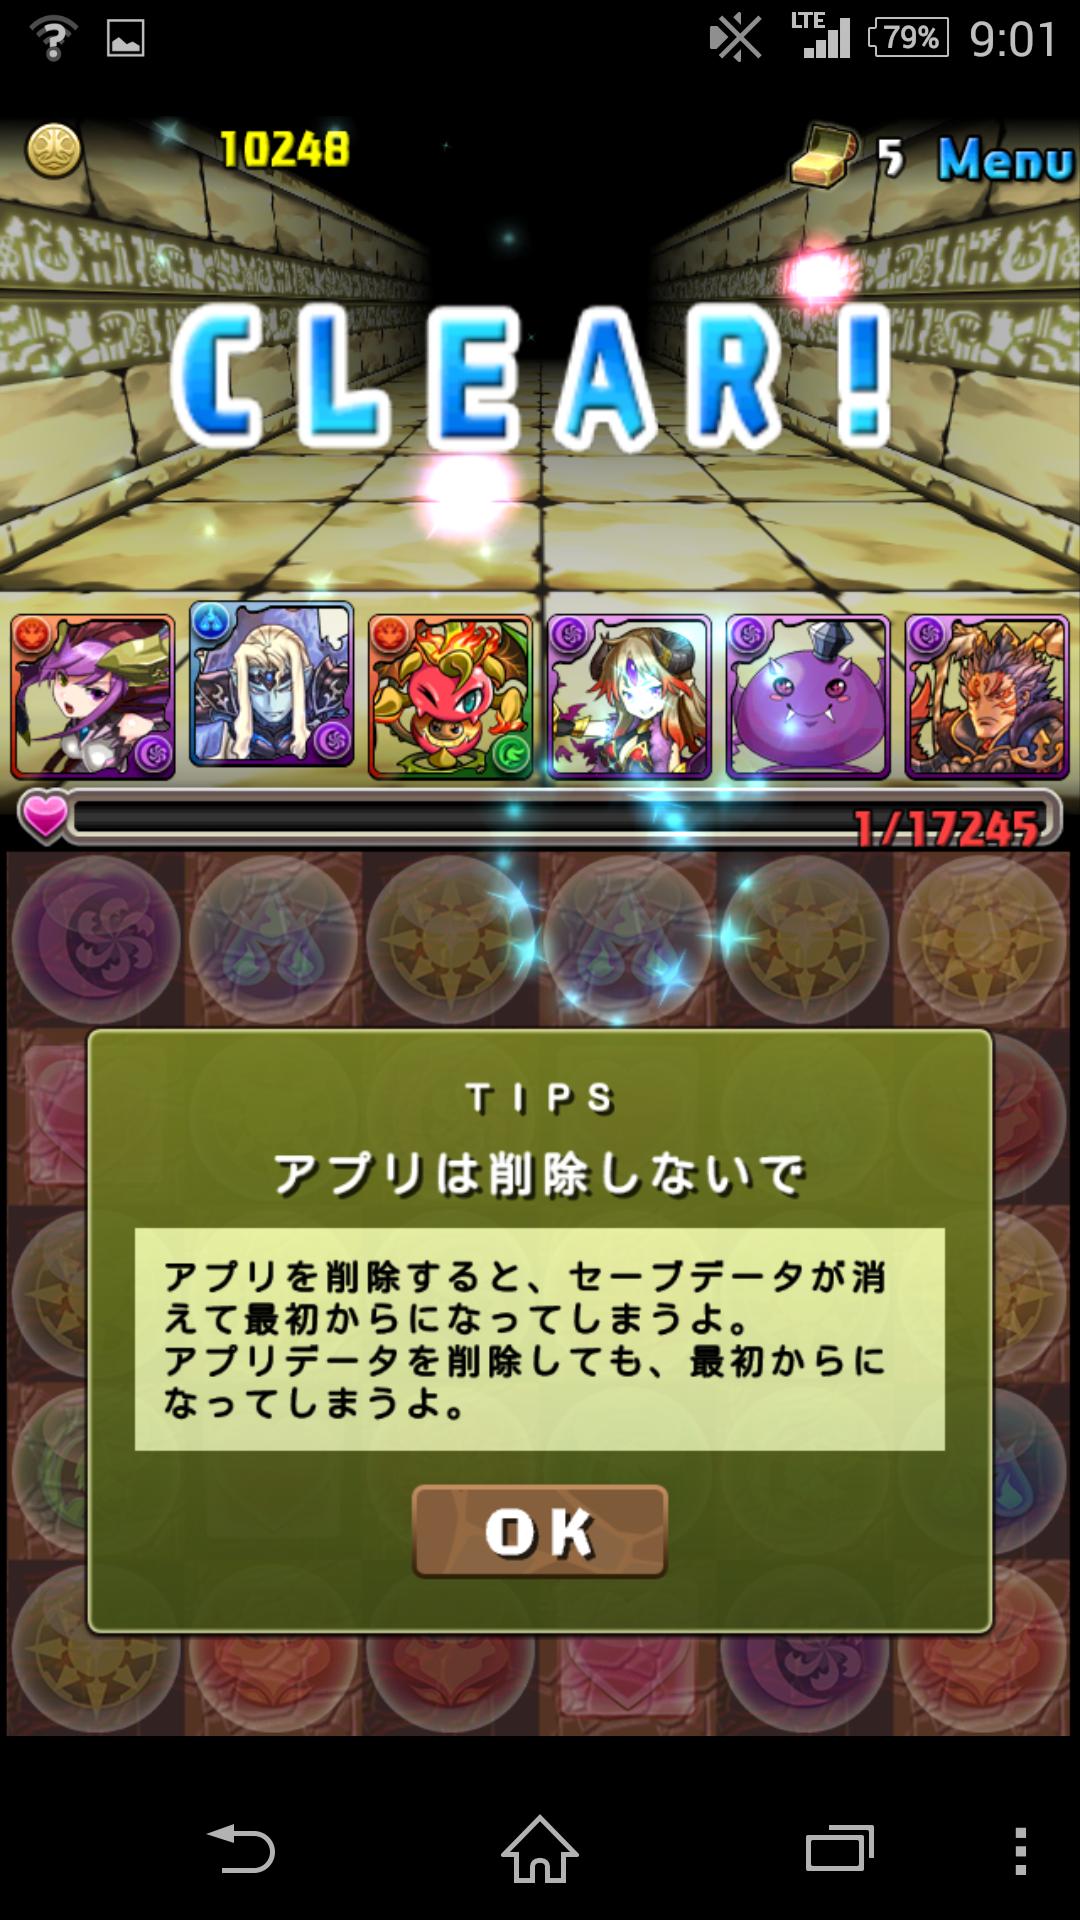 Screenshot_2014-11-15-09-02-00.png